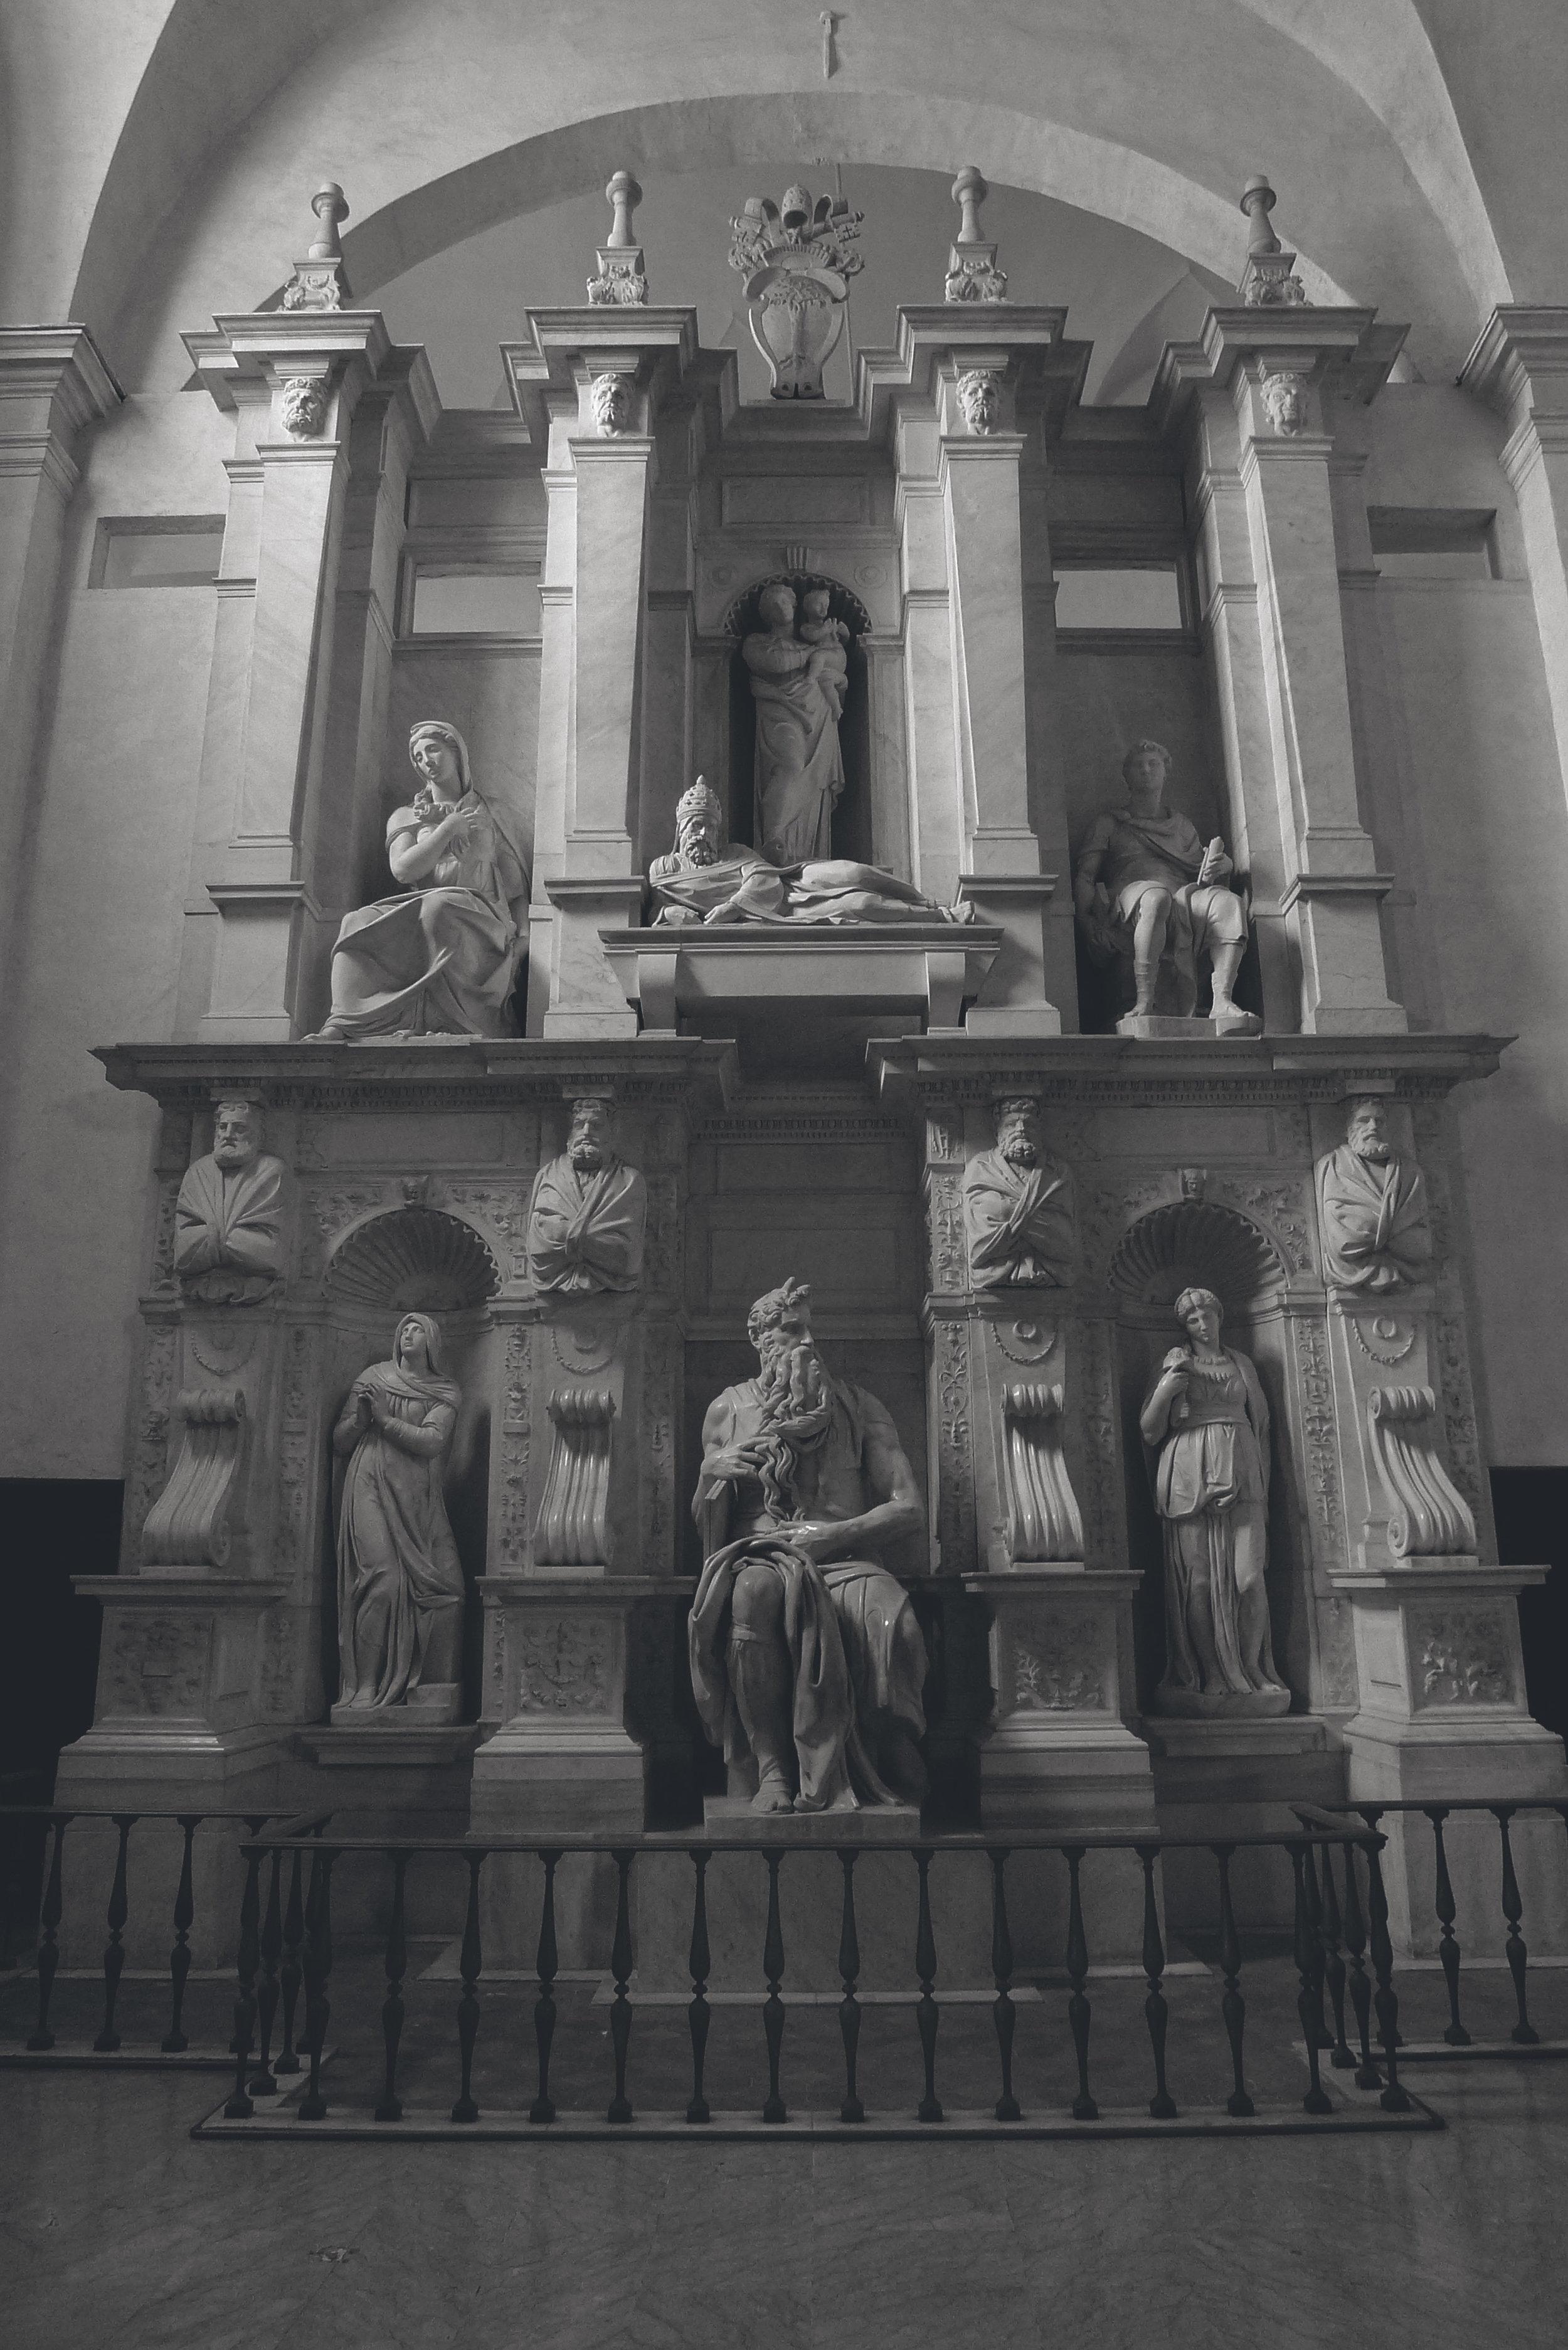 Inspiration-Michelangelo-Moses-12.jpg